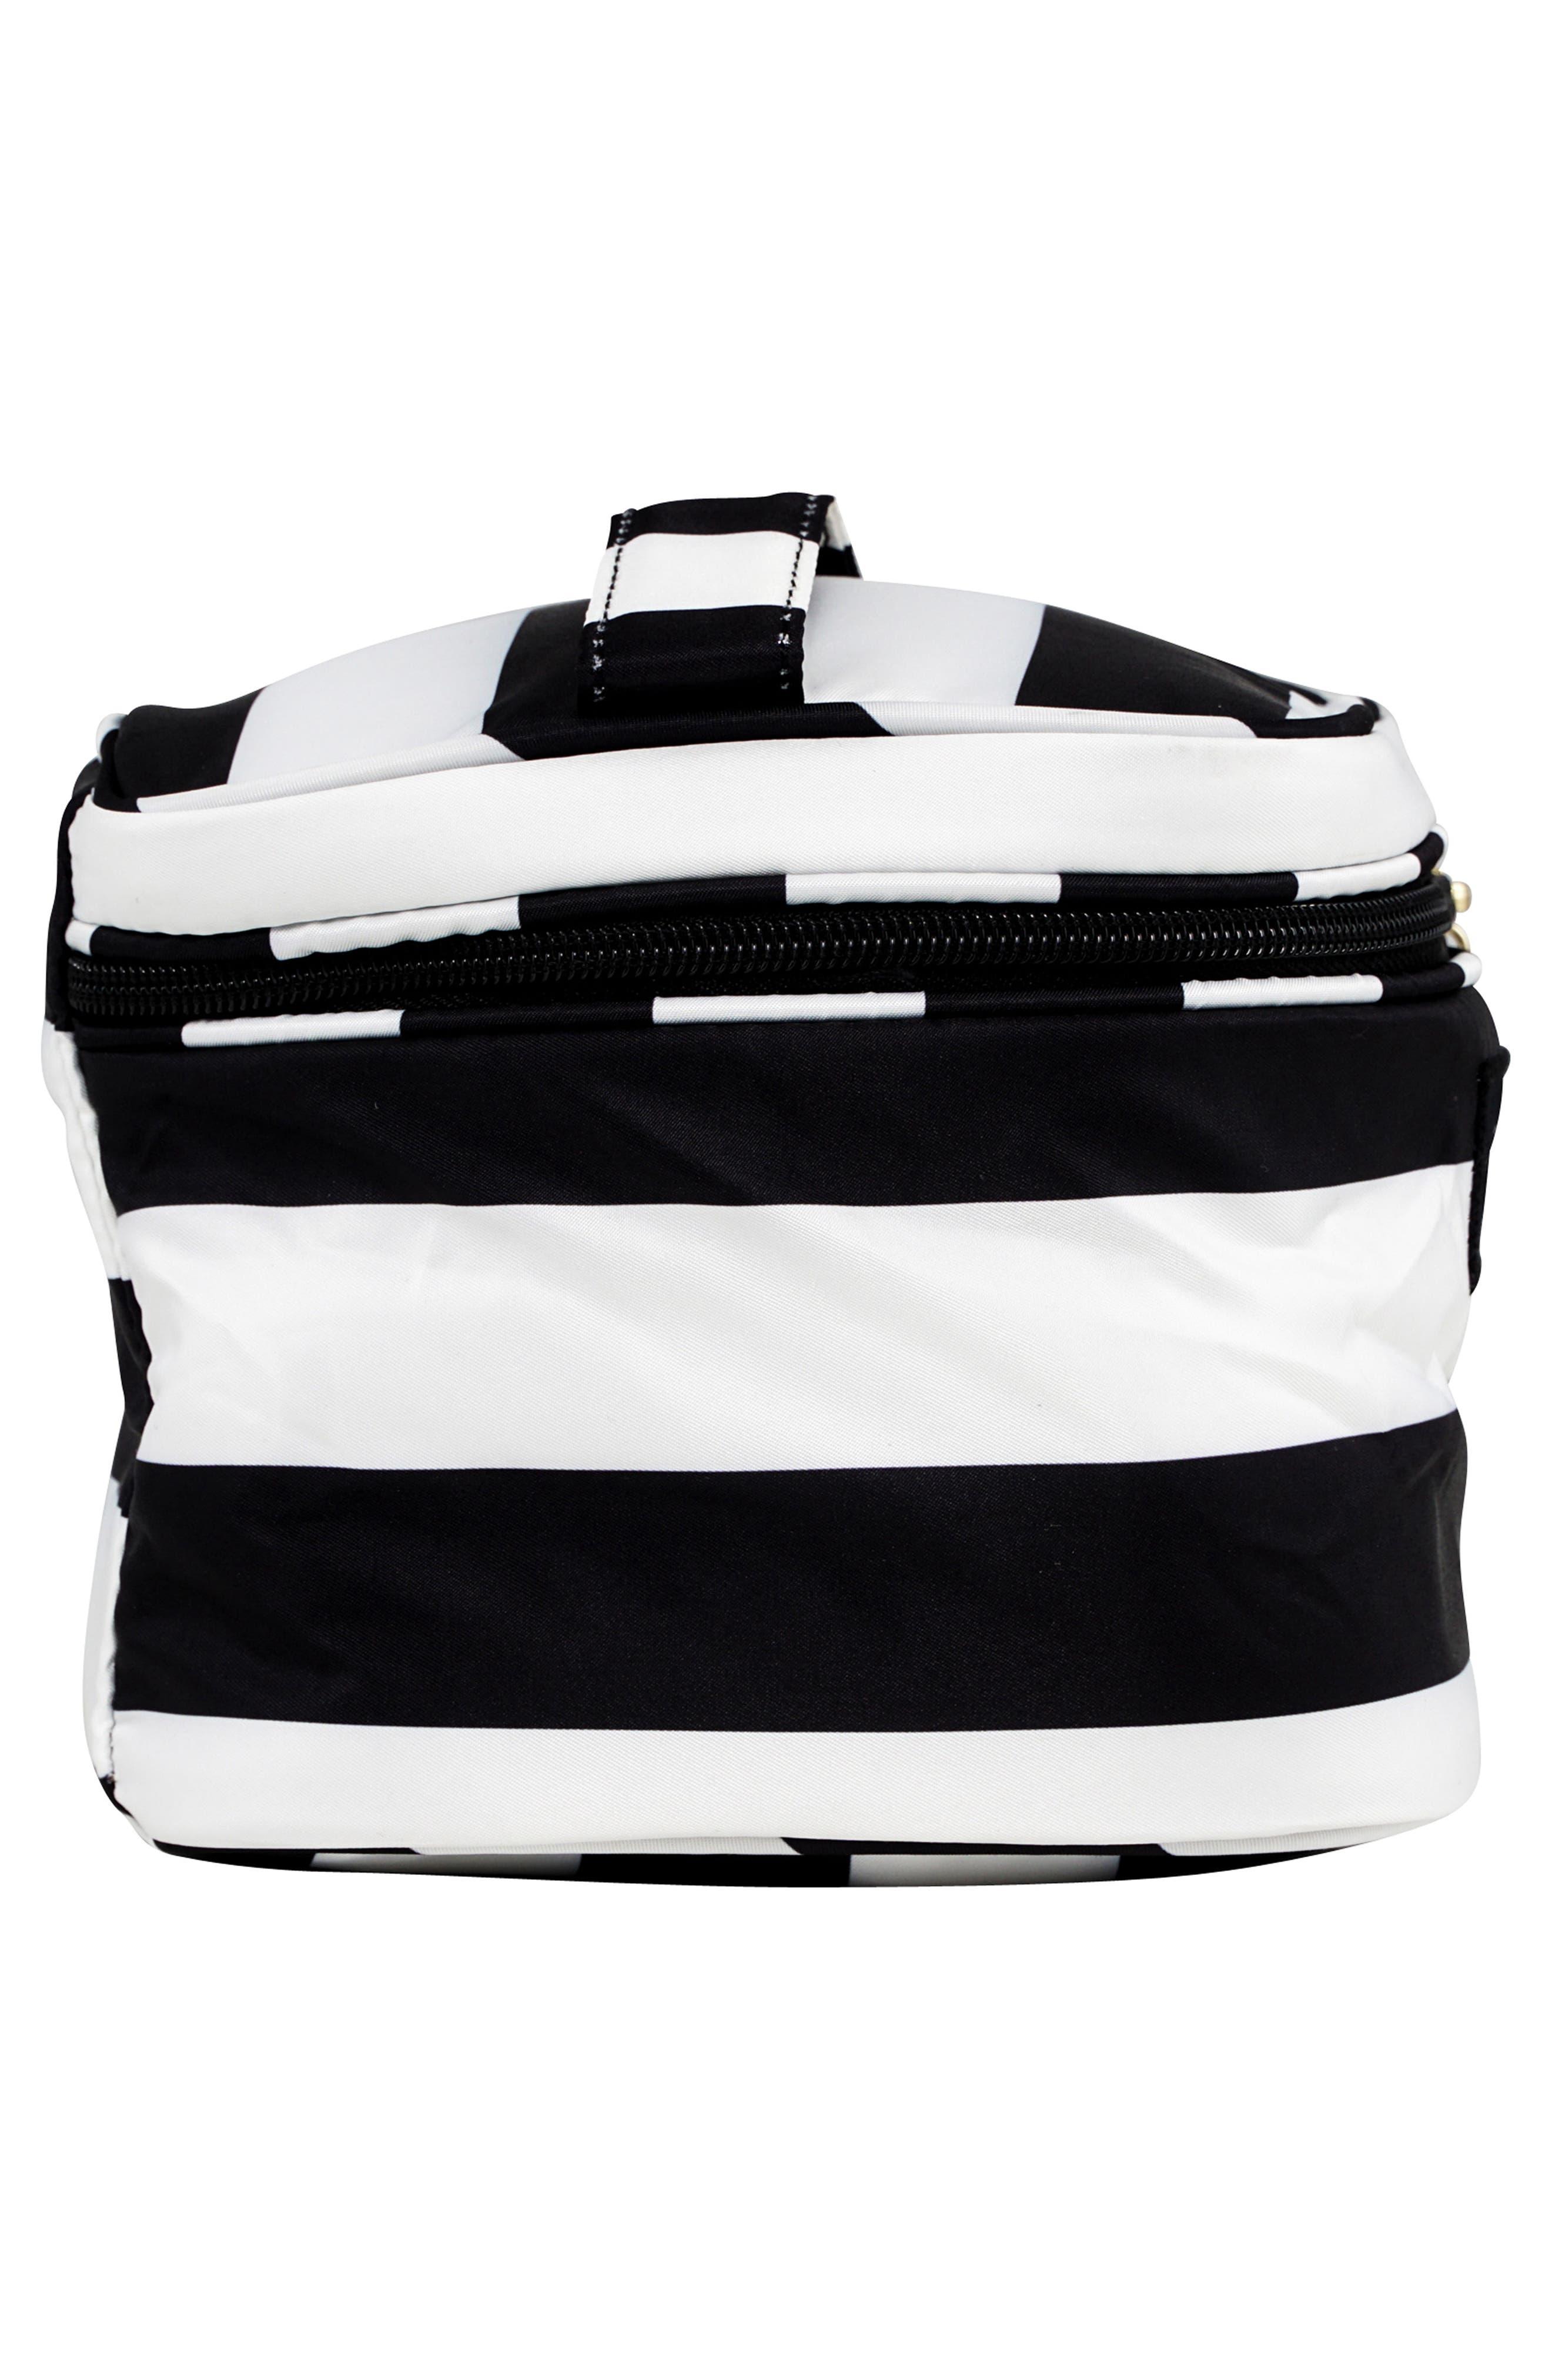 Alternate Image 2  - Ju-Ju-Be Legacy Be Equipped Pumping Bag Set